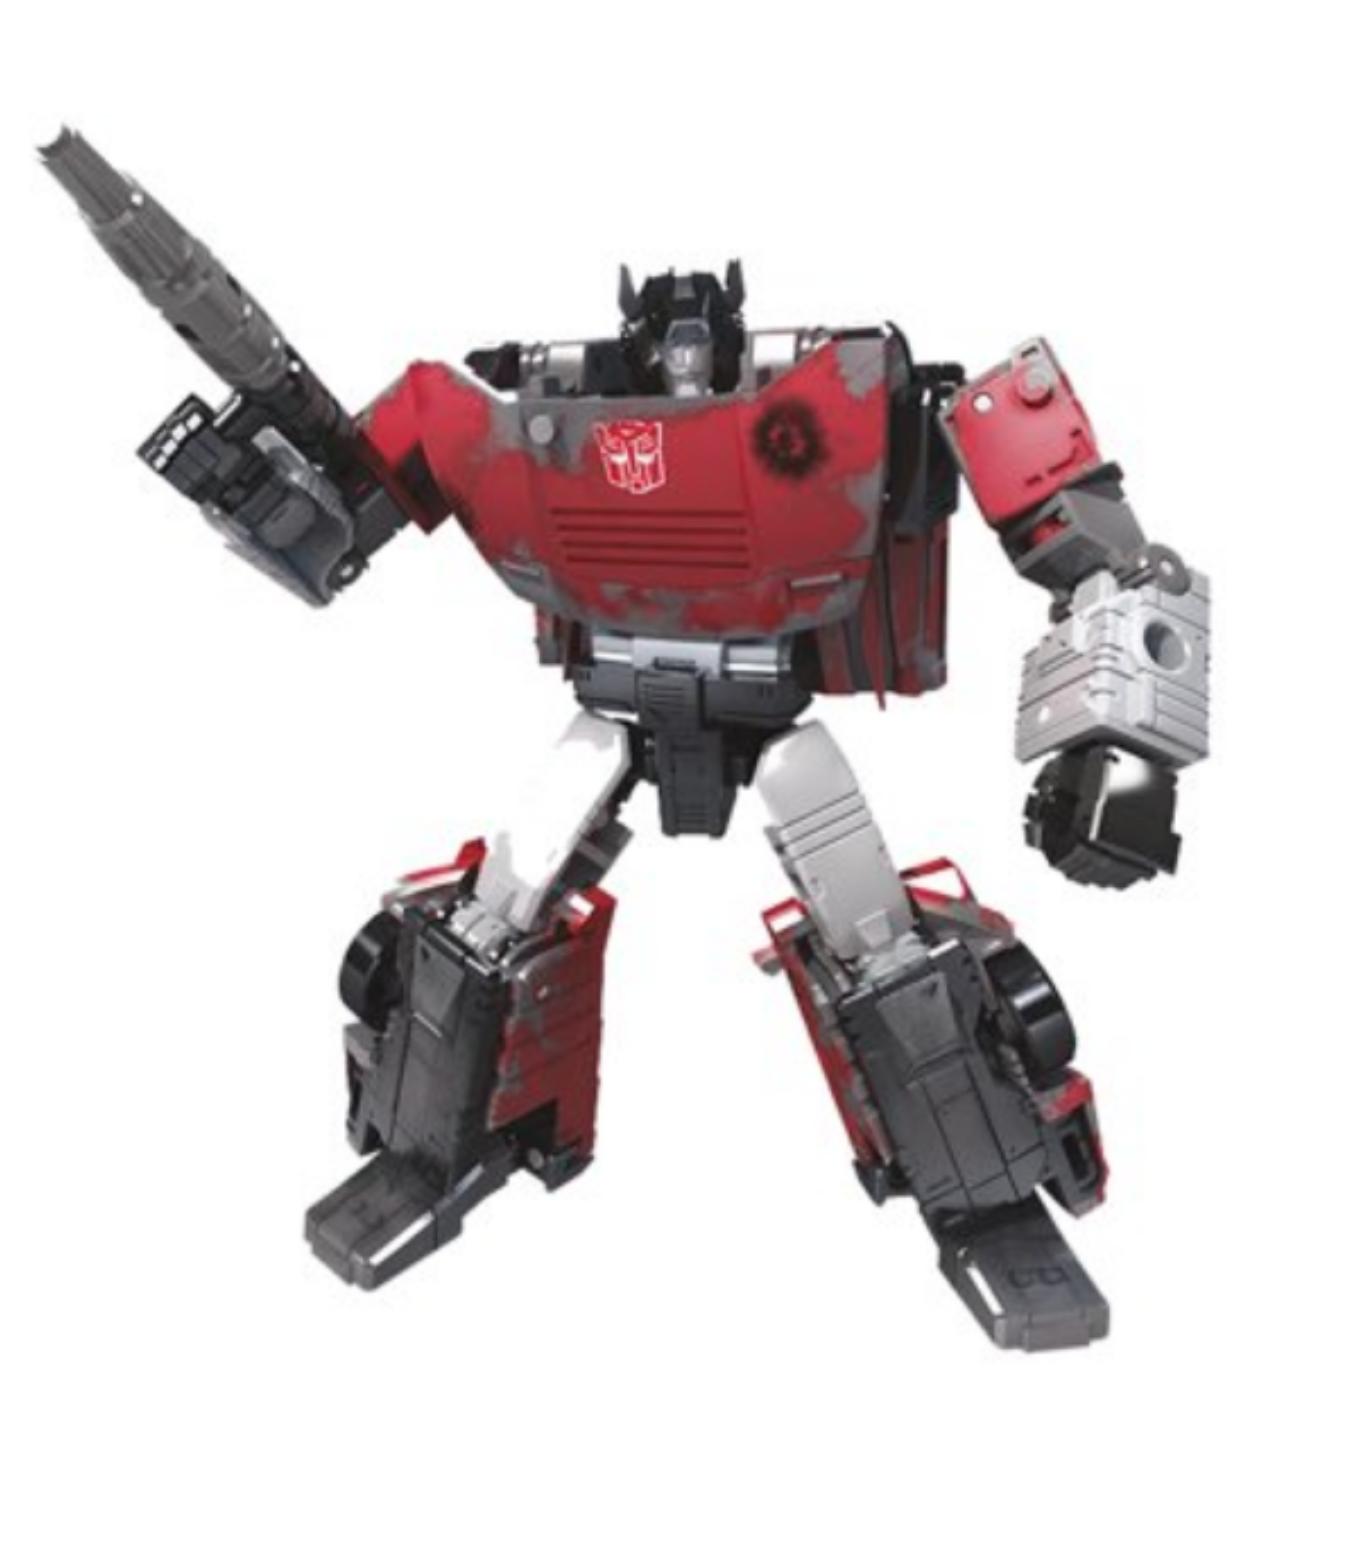 Mirage 1 Transformers War For Cybertron Netflix Scrapface lot of 2 1